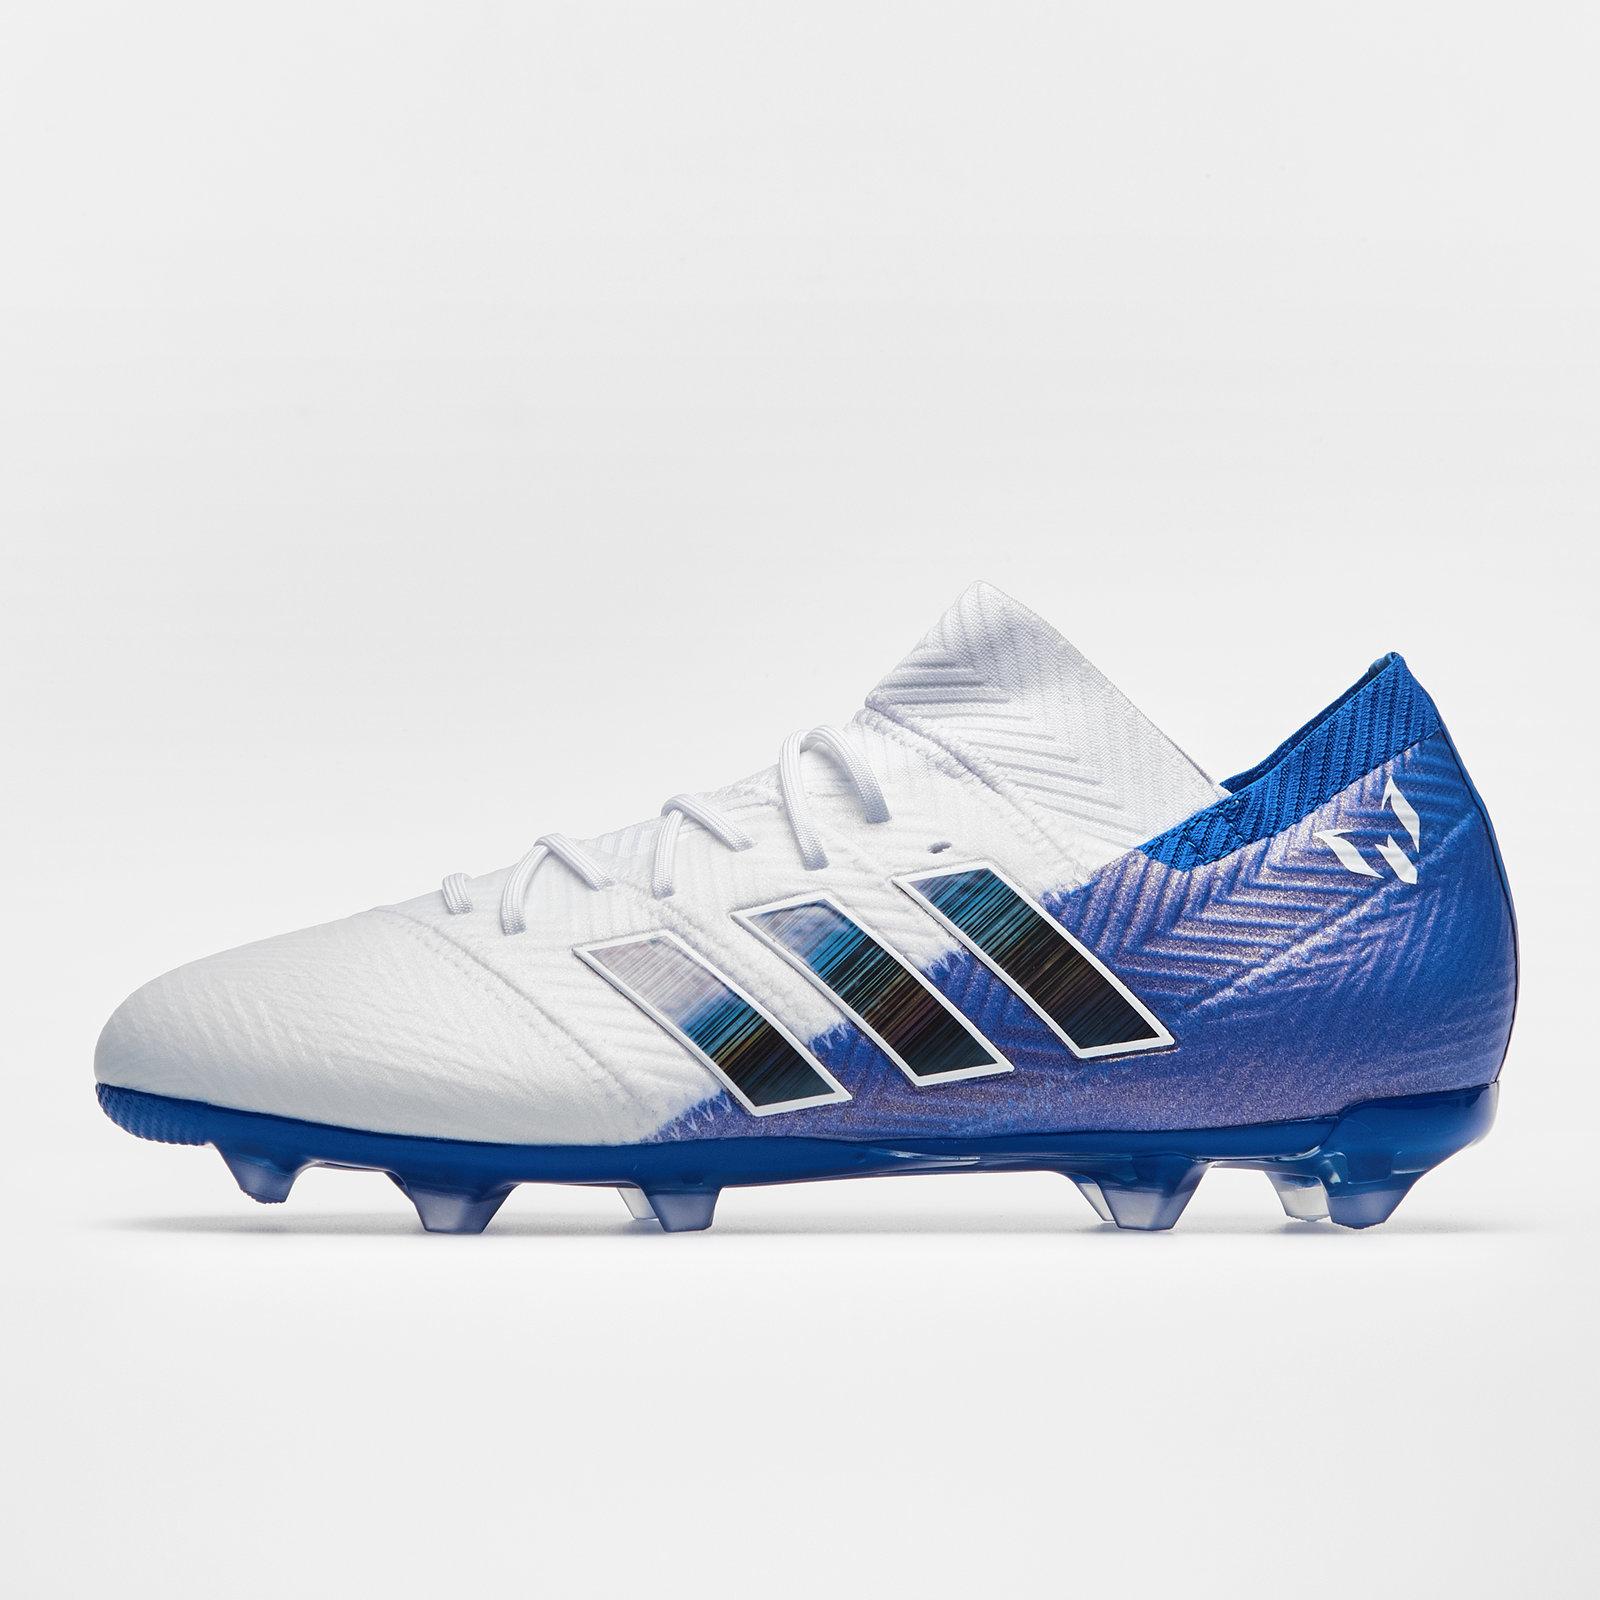 e7cfc64b9a57 adidas Nemeziz Messi 18.1 Firm Ground Kids Football Boots Studs Trainers  Sports